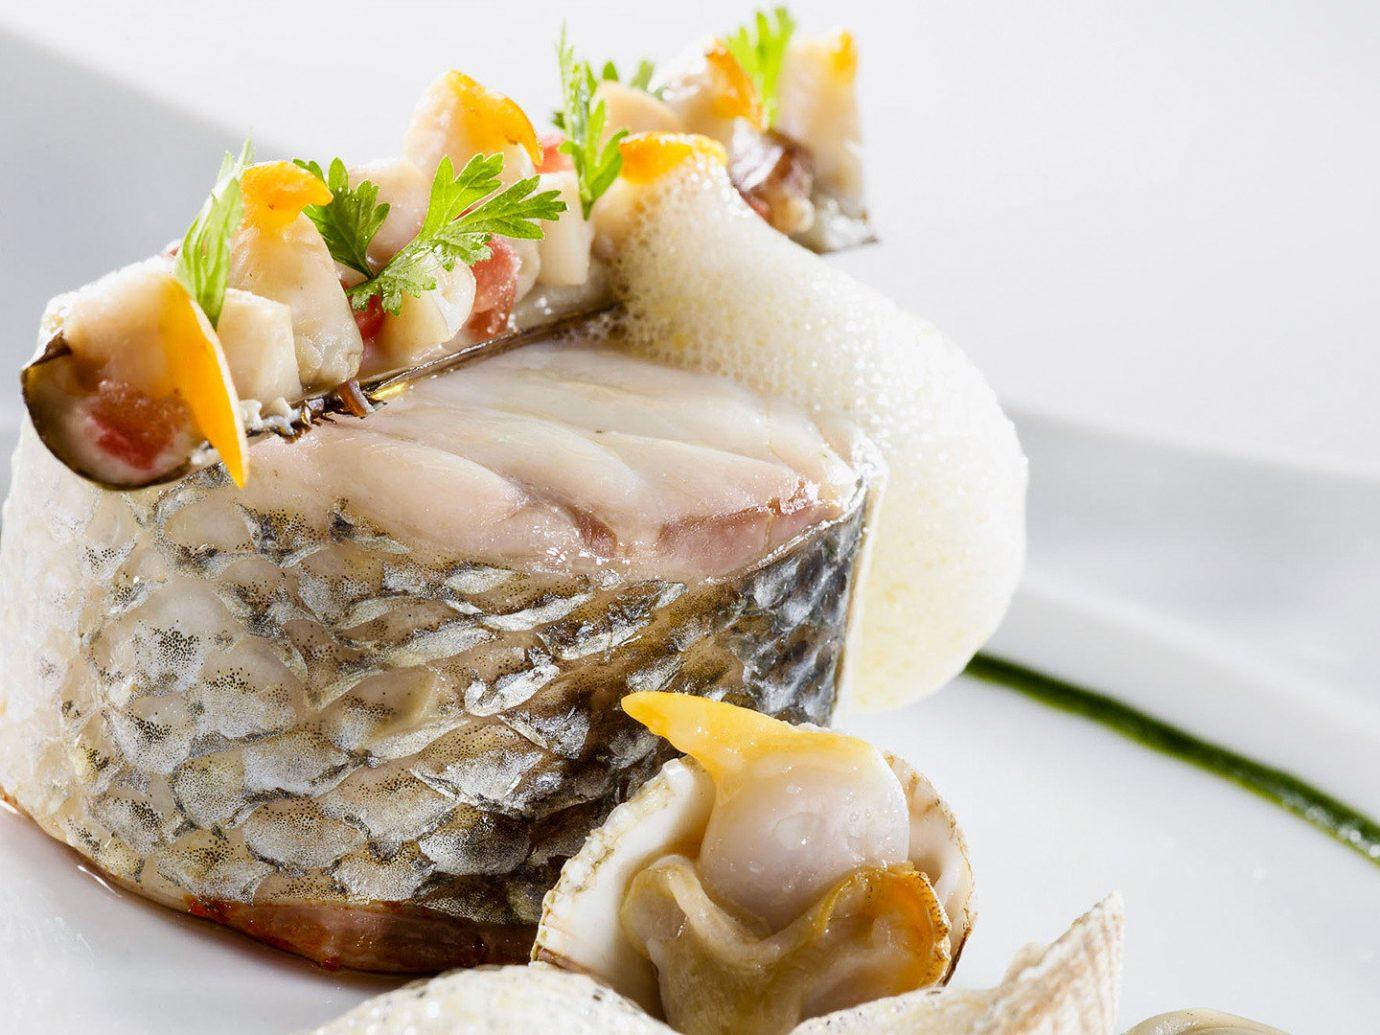 Food + Drink Romance food plate dish Seafood animal source foods cuisine recipe dessert